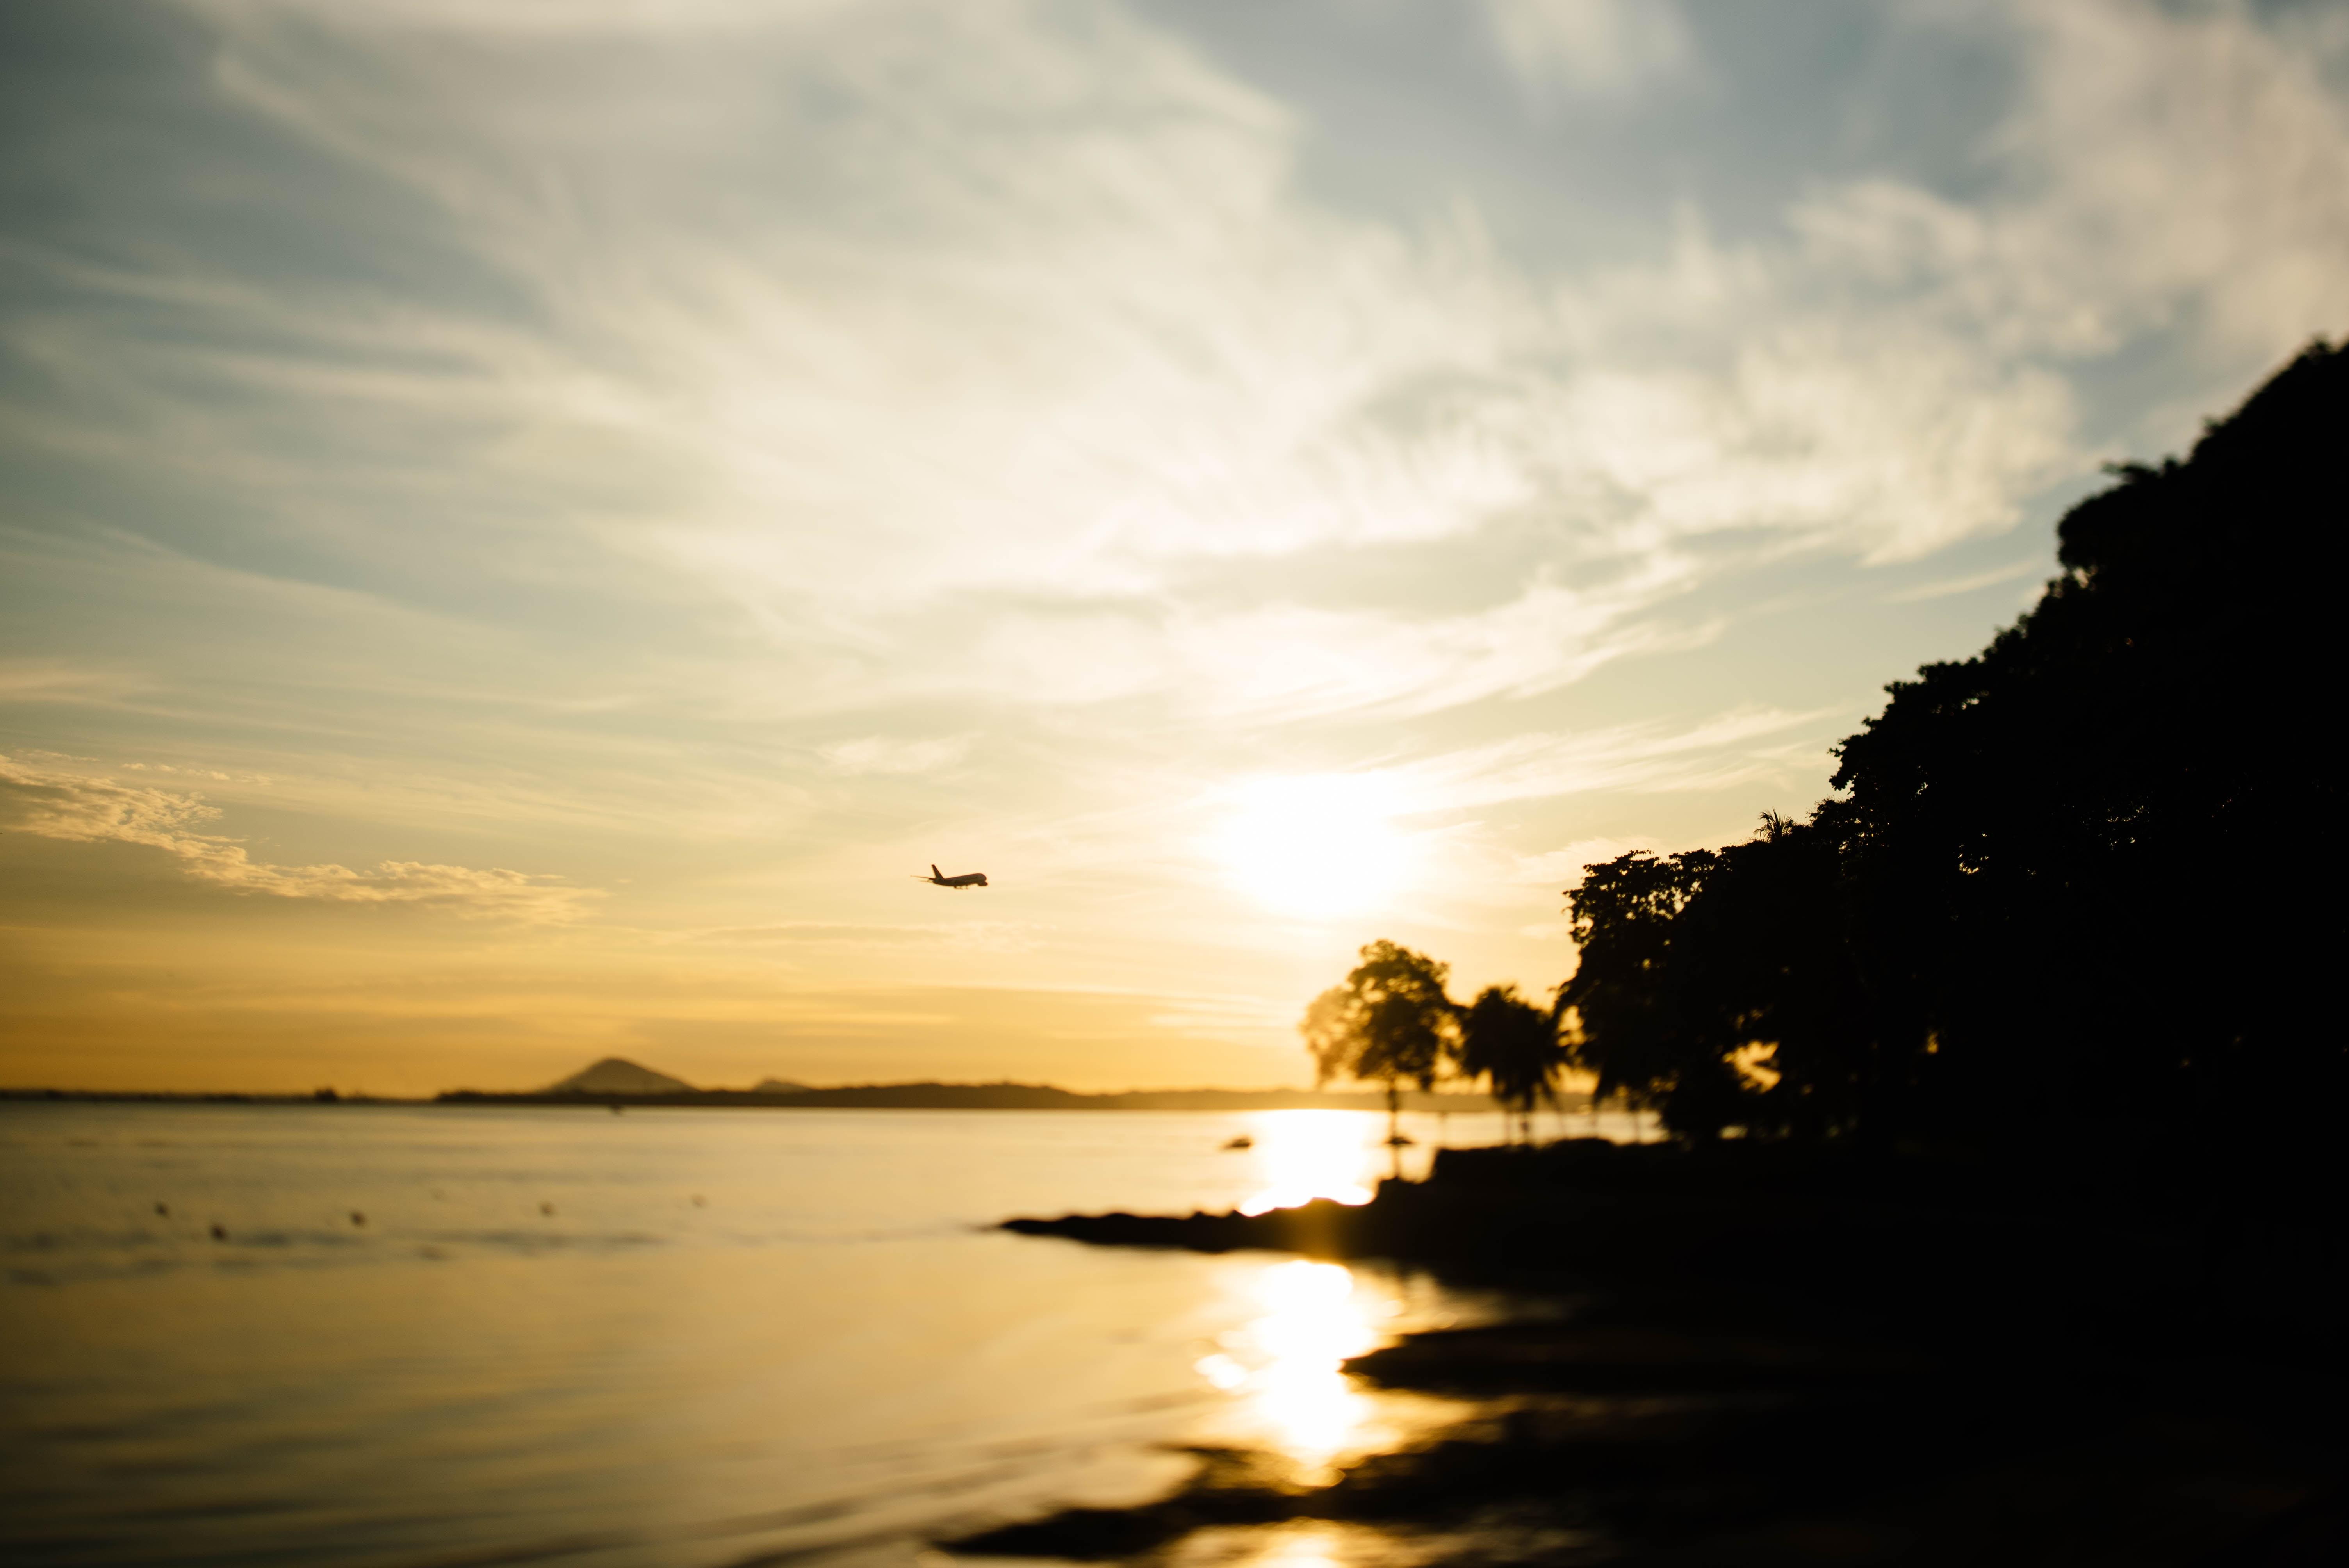 airplane during sunset